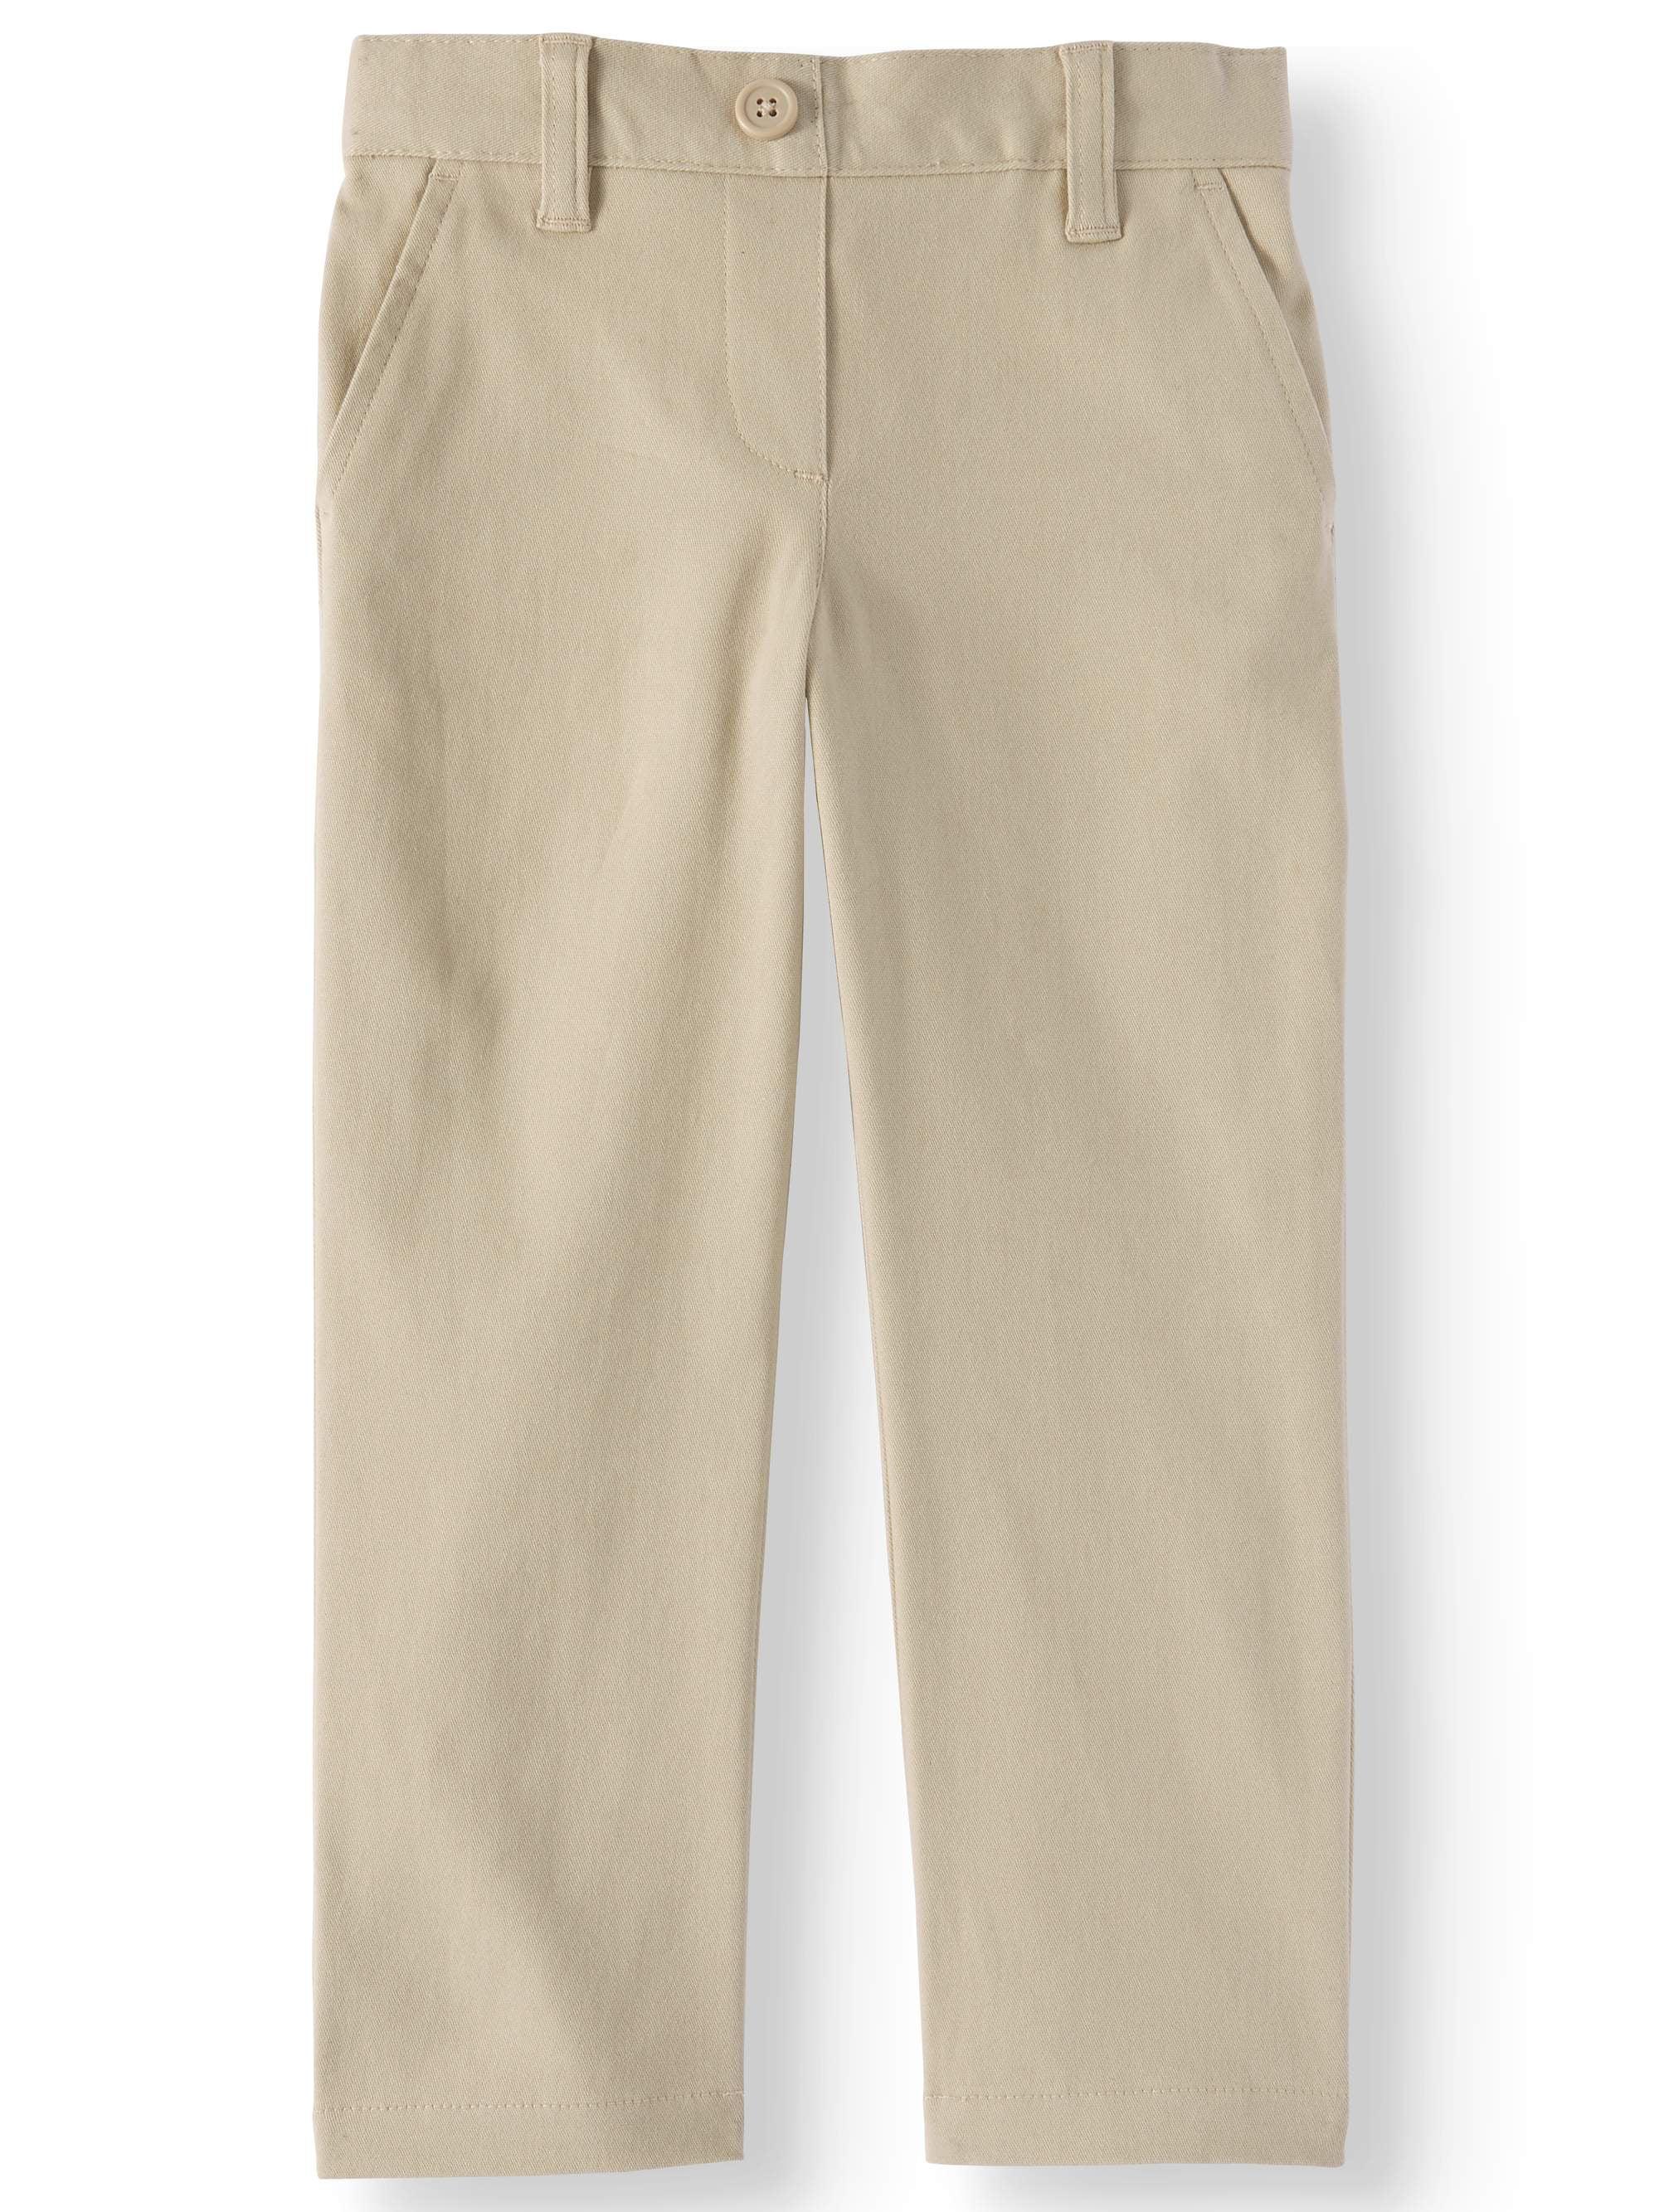 Toddler Girls School Uniform Stretch Twill Pants